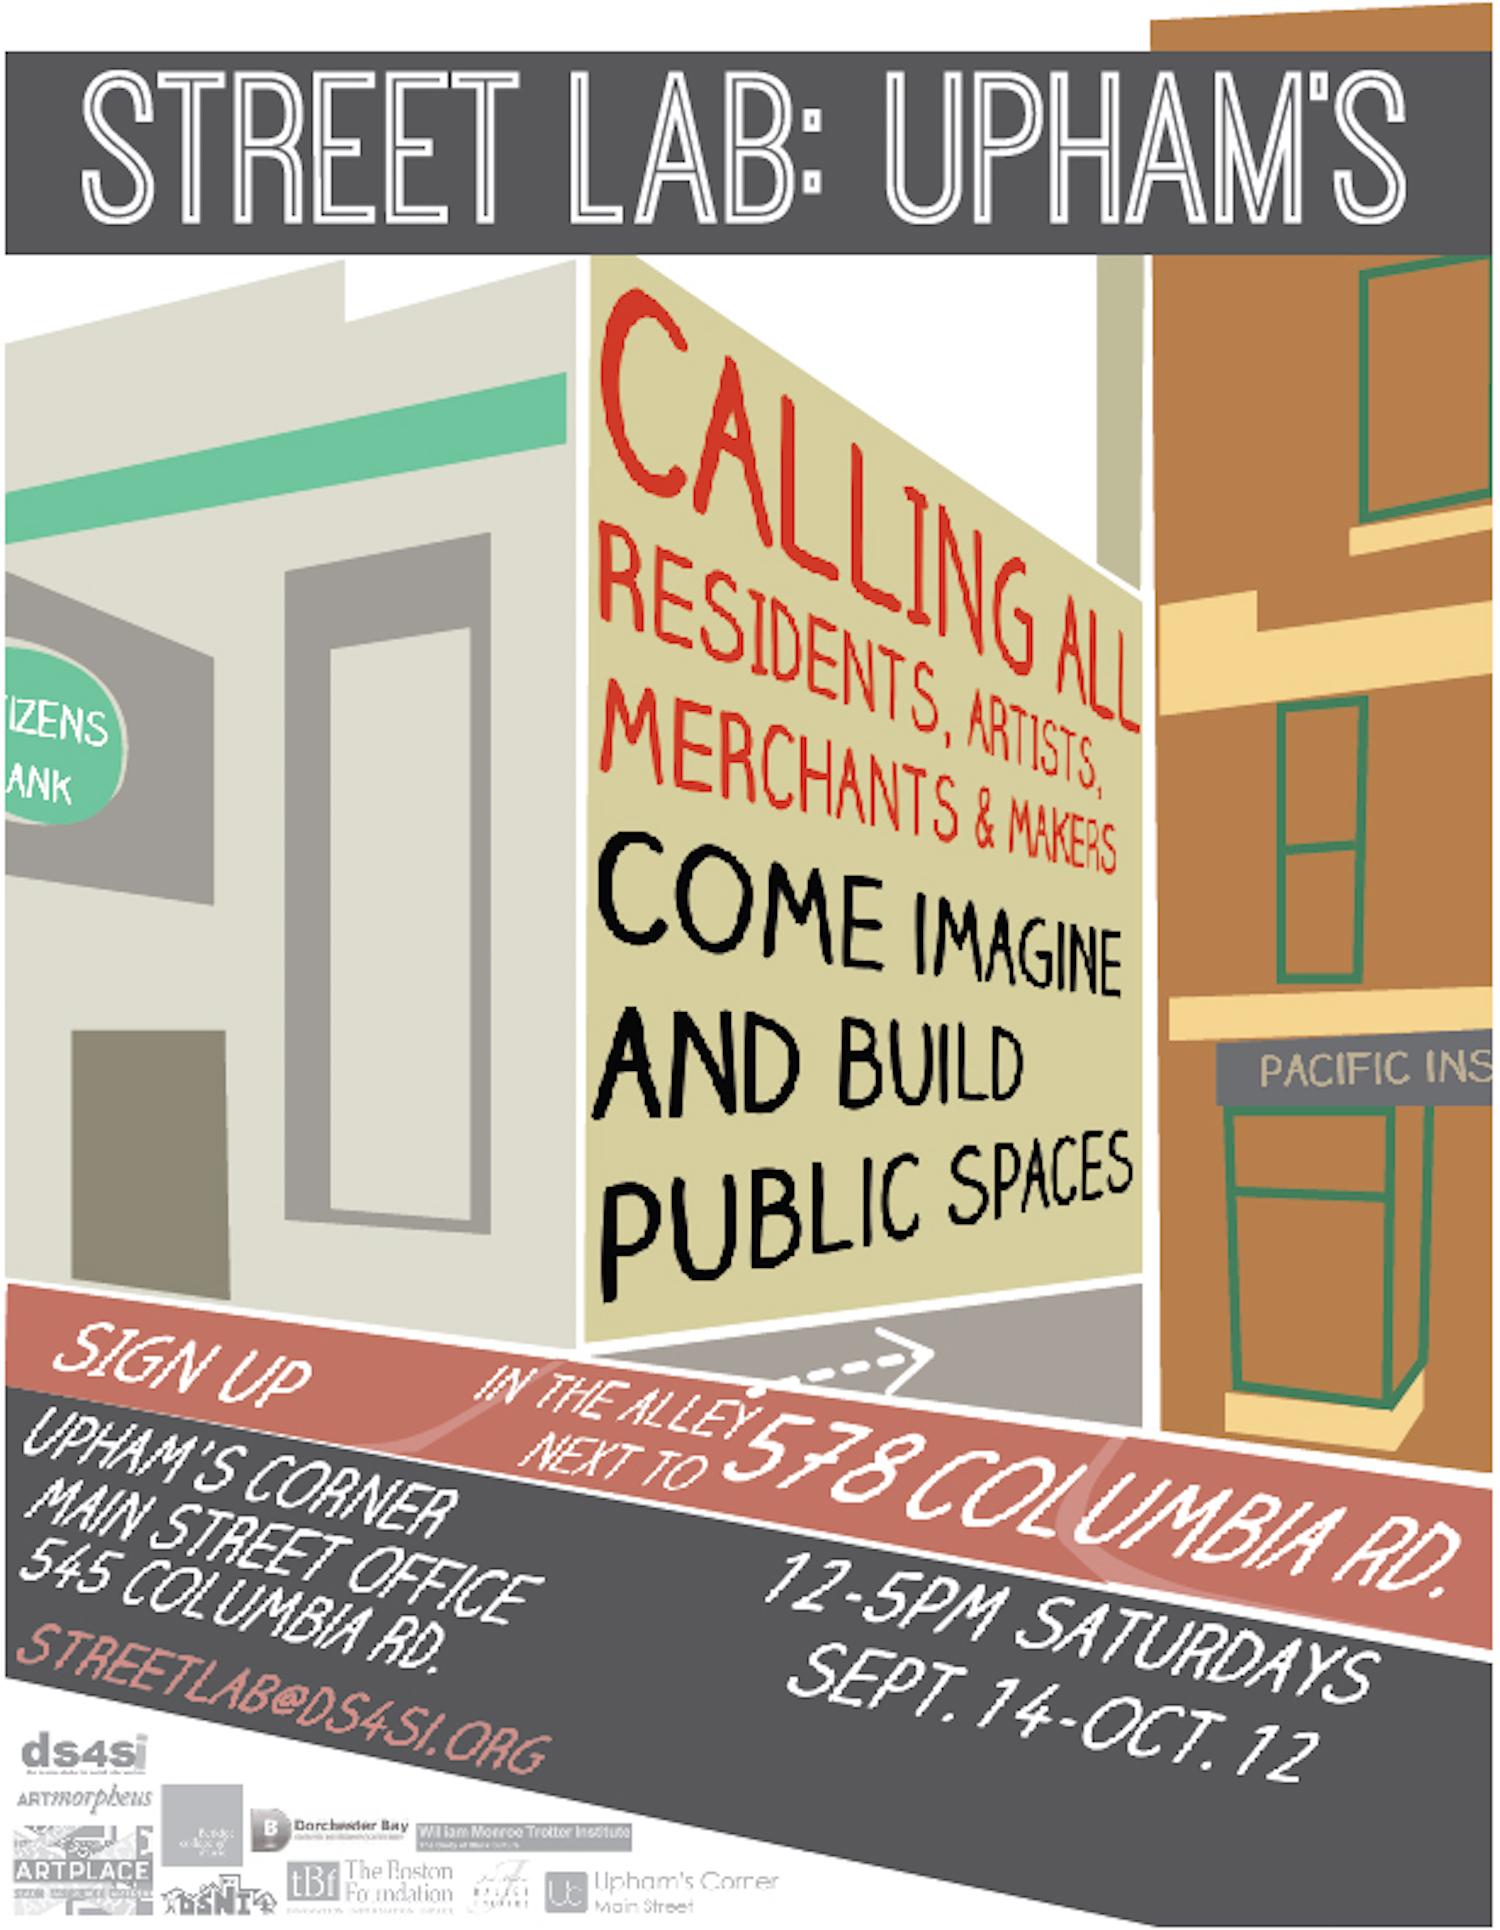 streetlabuphams-poster.jpg